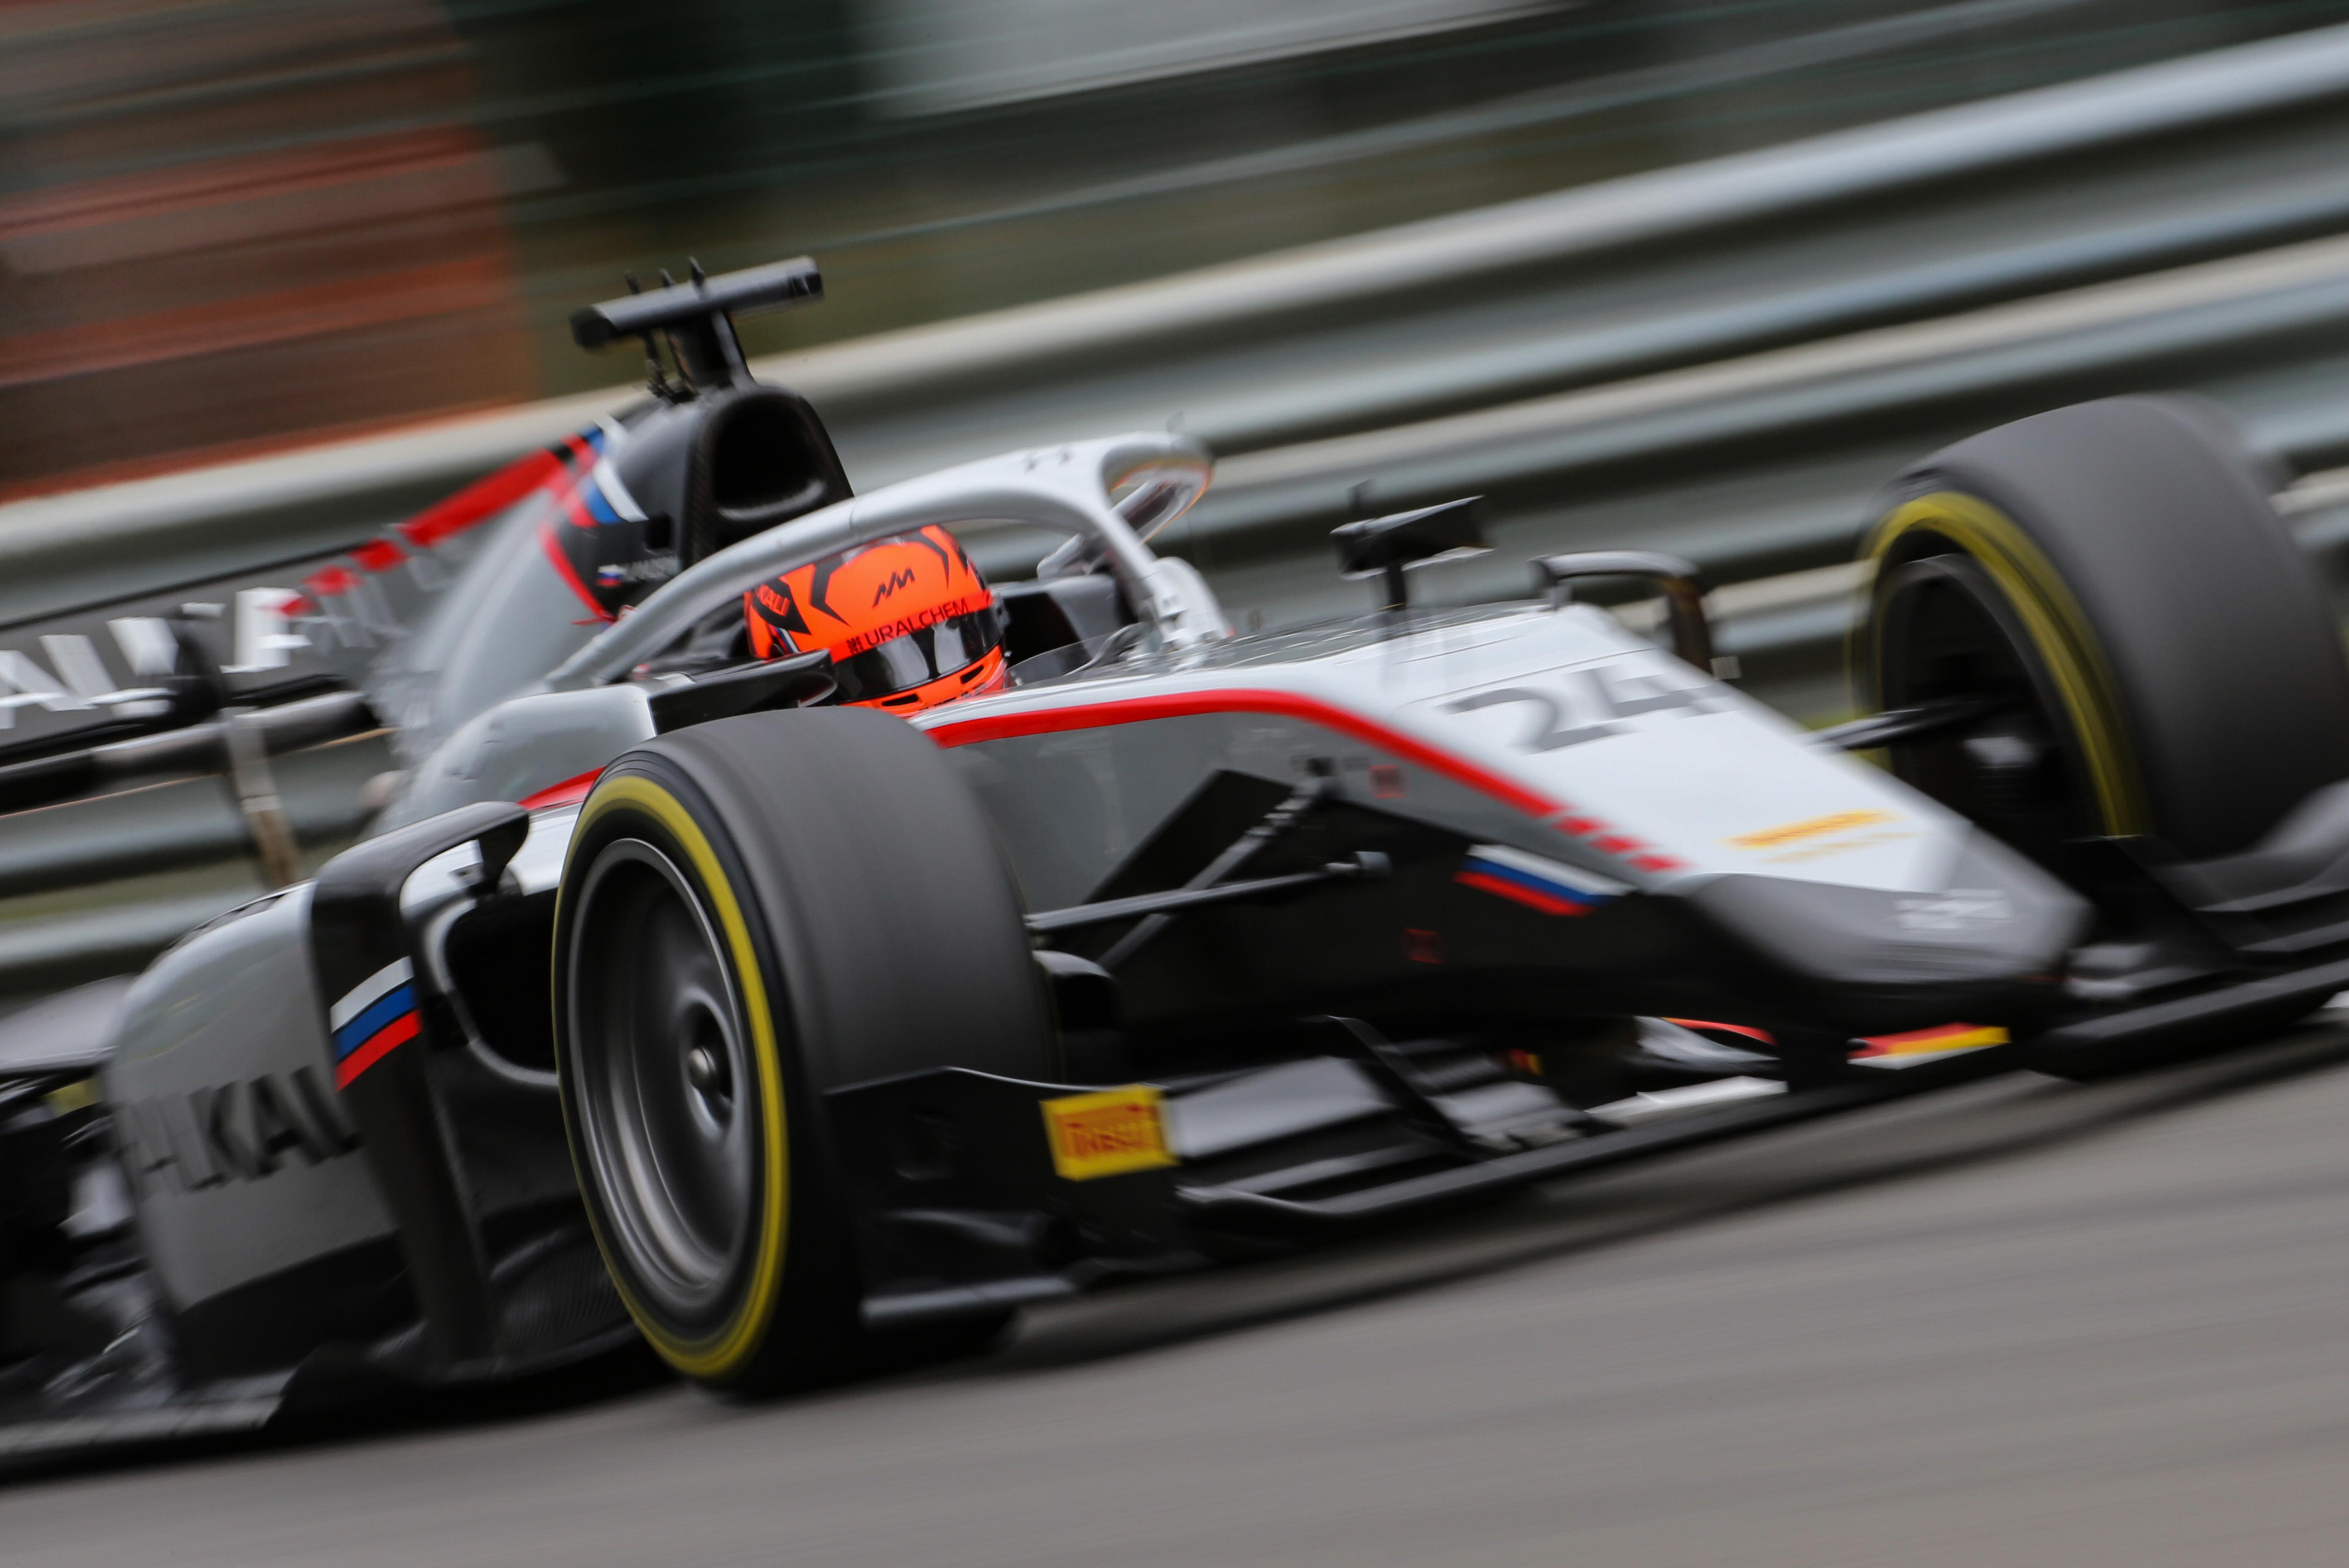 Motor Racing Fia Formula 2 Championship Friday Spa Francorchamps, Belgium